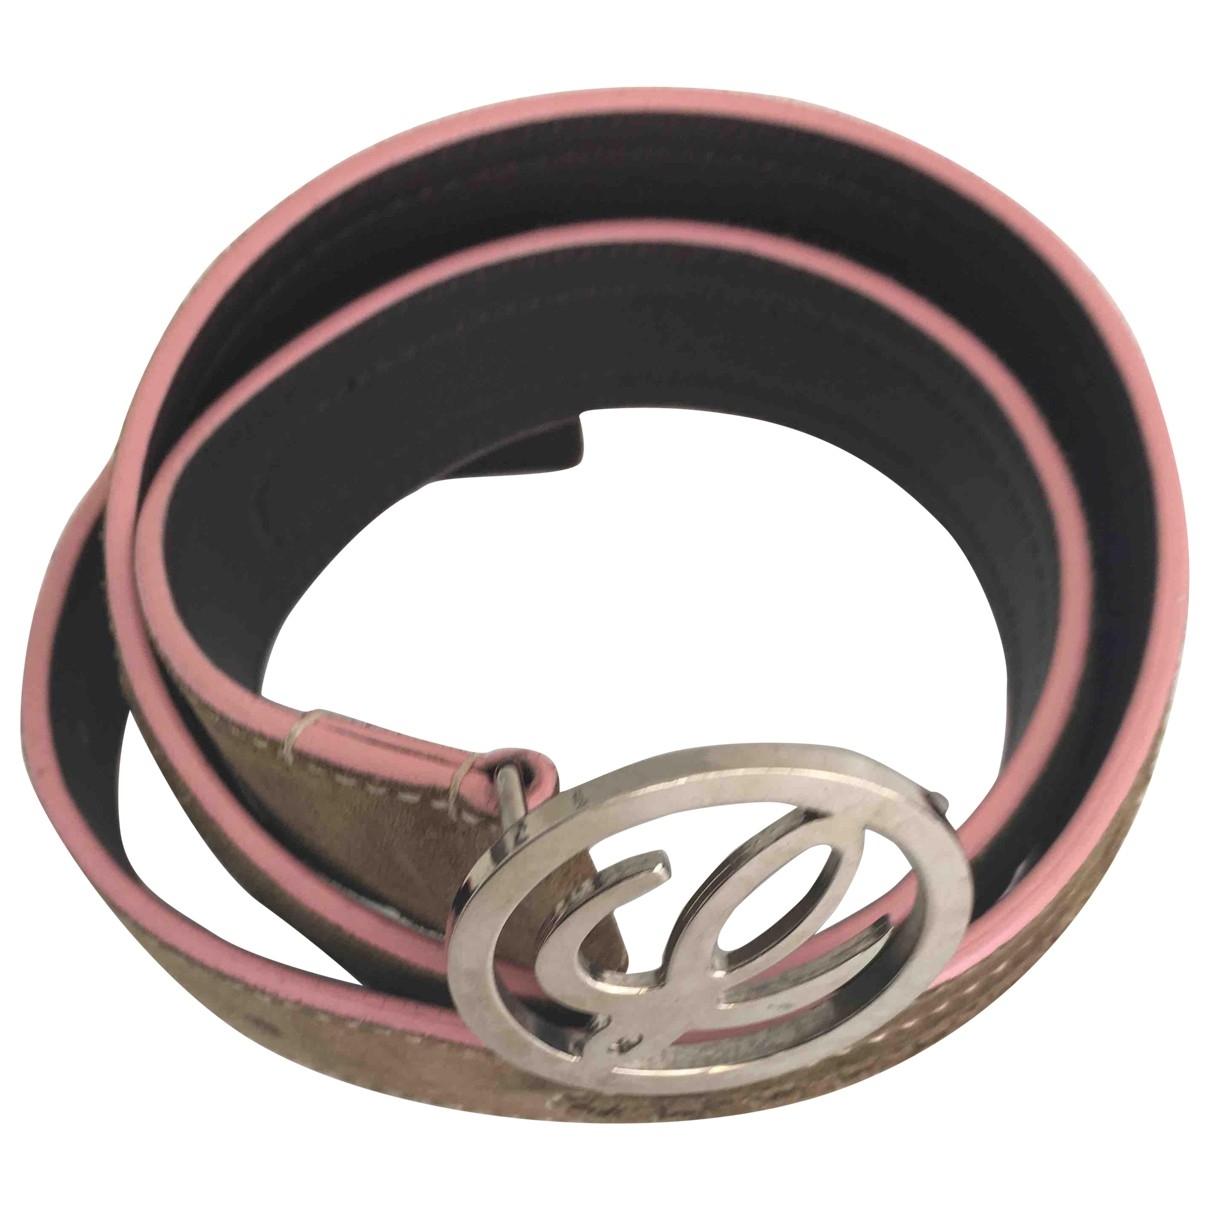 Loewe \N Green Leather belt for Women 80 cm